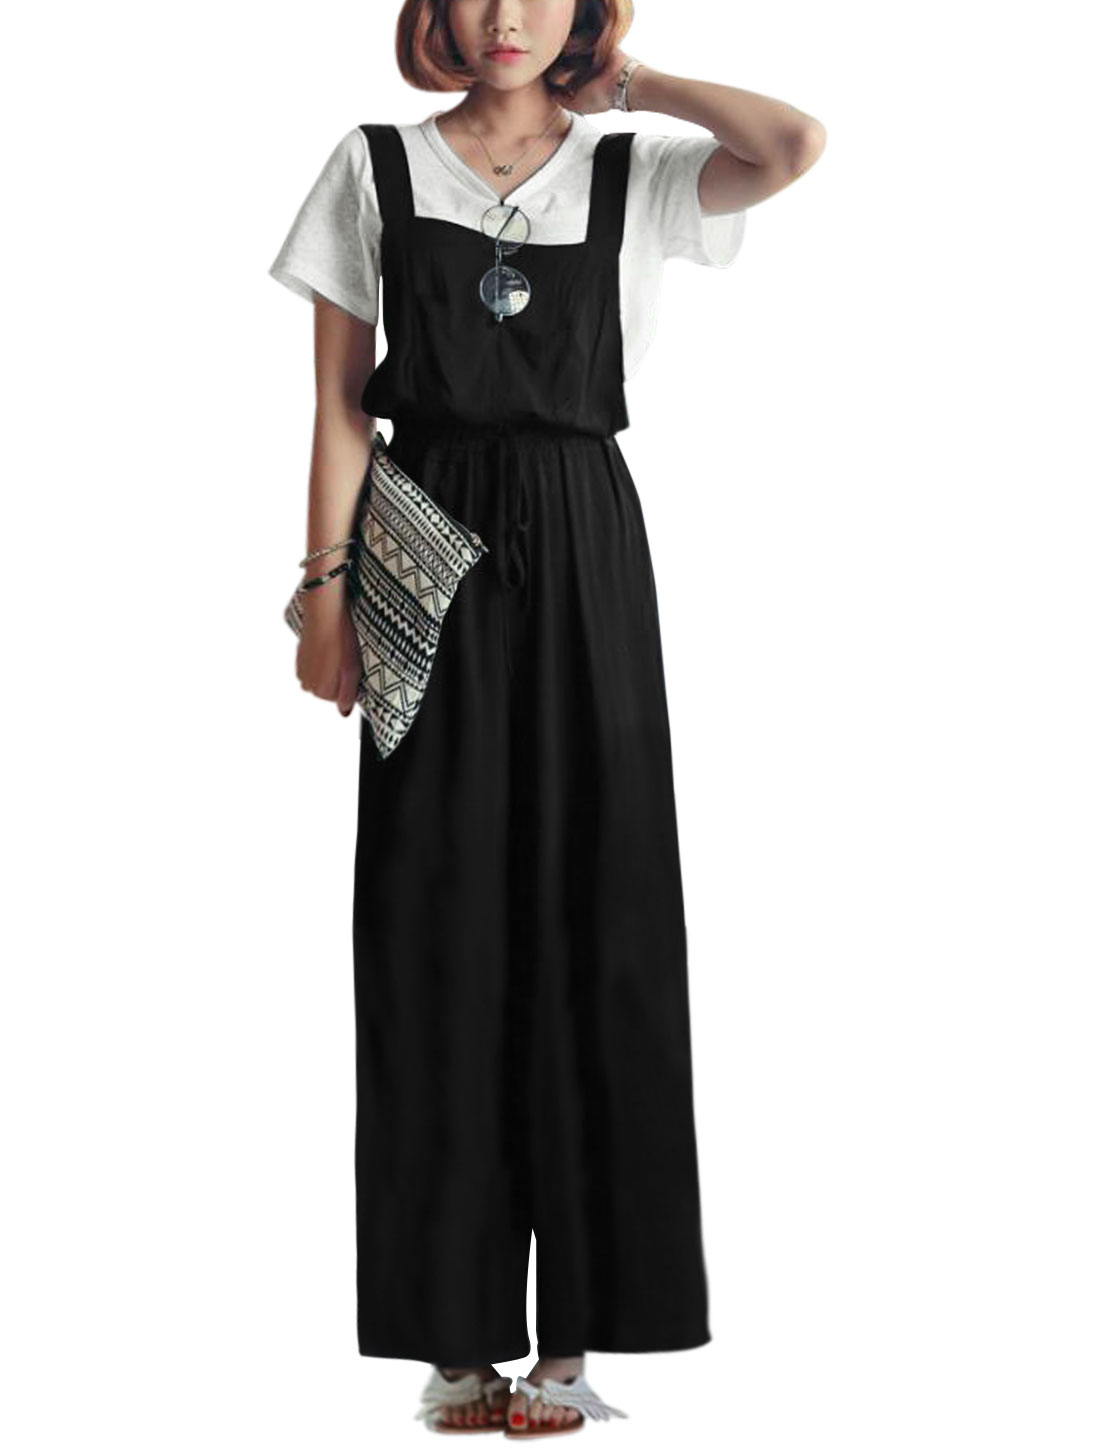 Women Elastic Waist Bow Knot Decor Wide Leg Suspender Pants Black XS